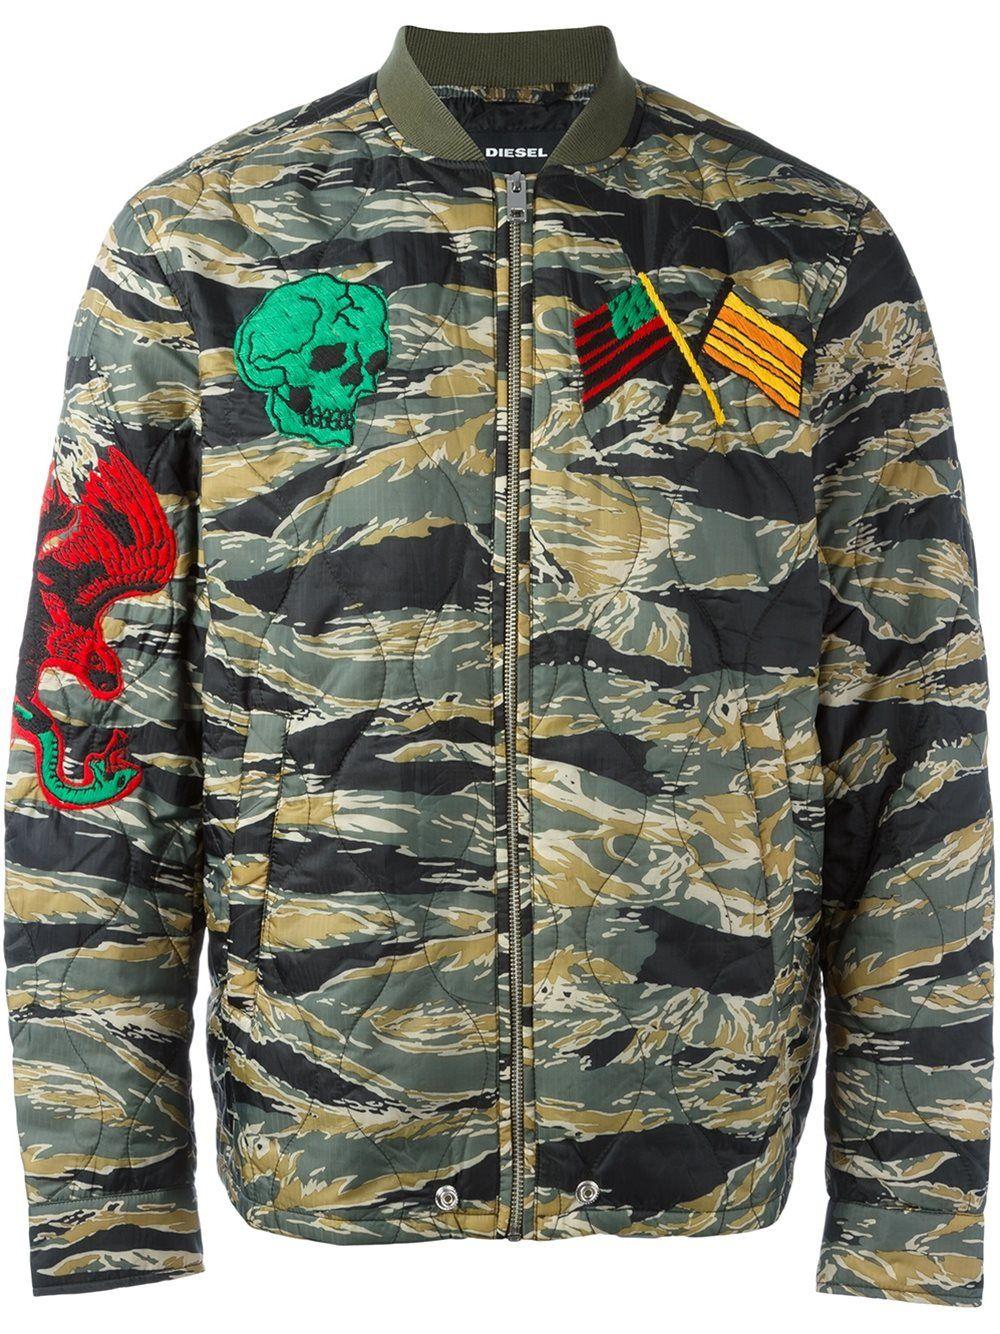 Diesel W Camu Bomber Jacket Green Jacket Men Bomber Jacket Quilted Bomber Jacket [ 1334 x 1000 Pixel ]